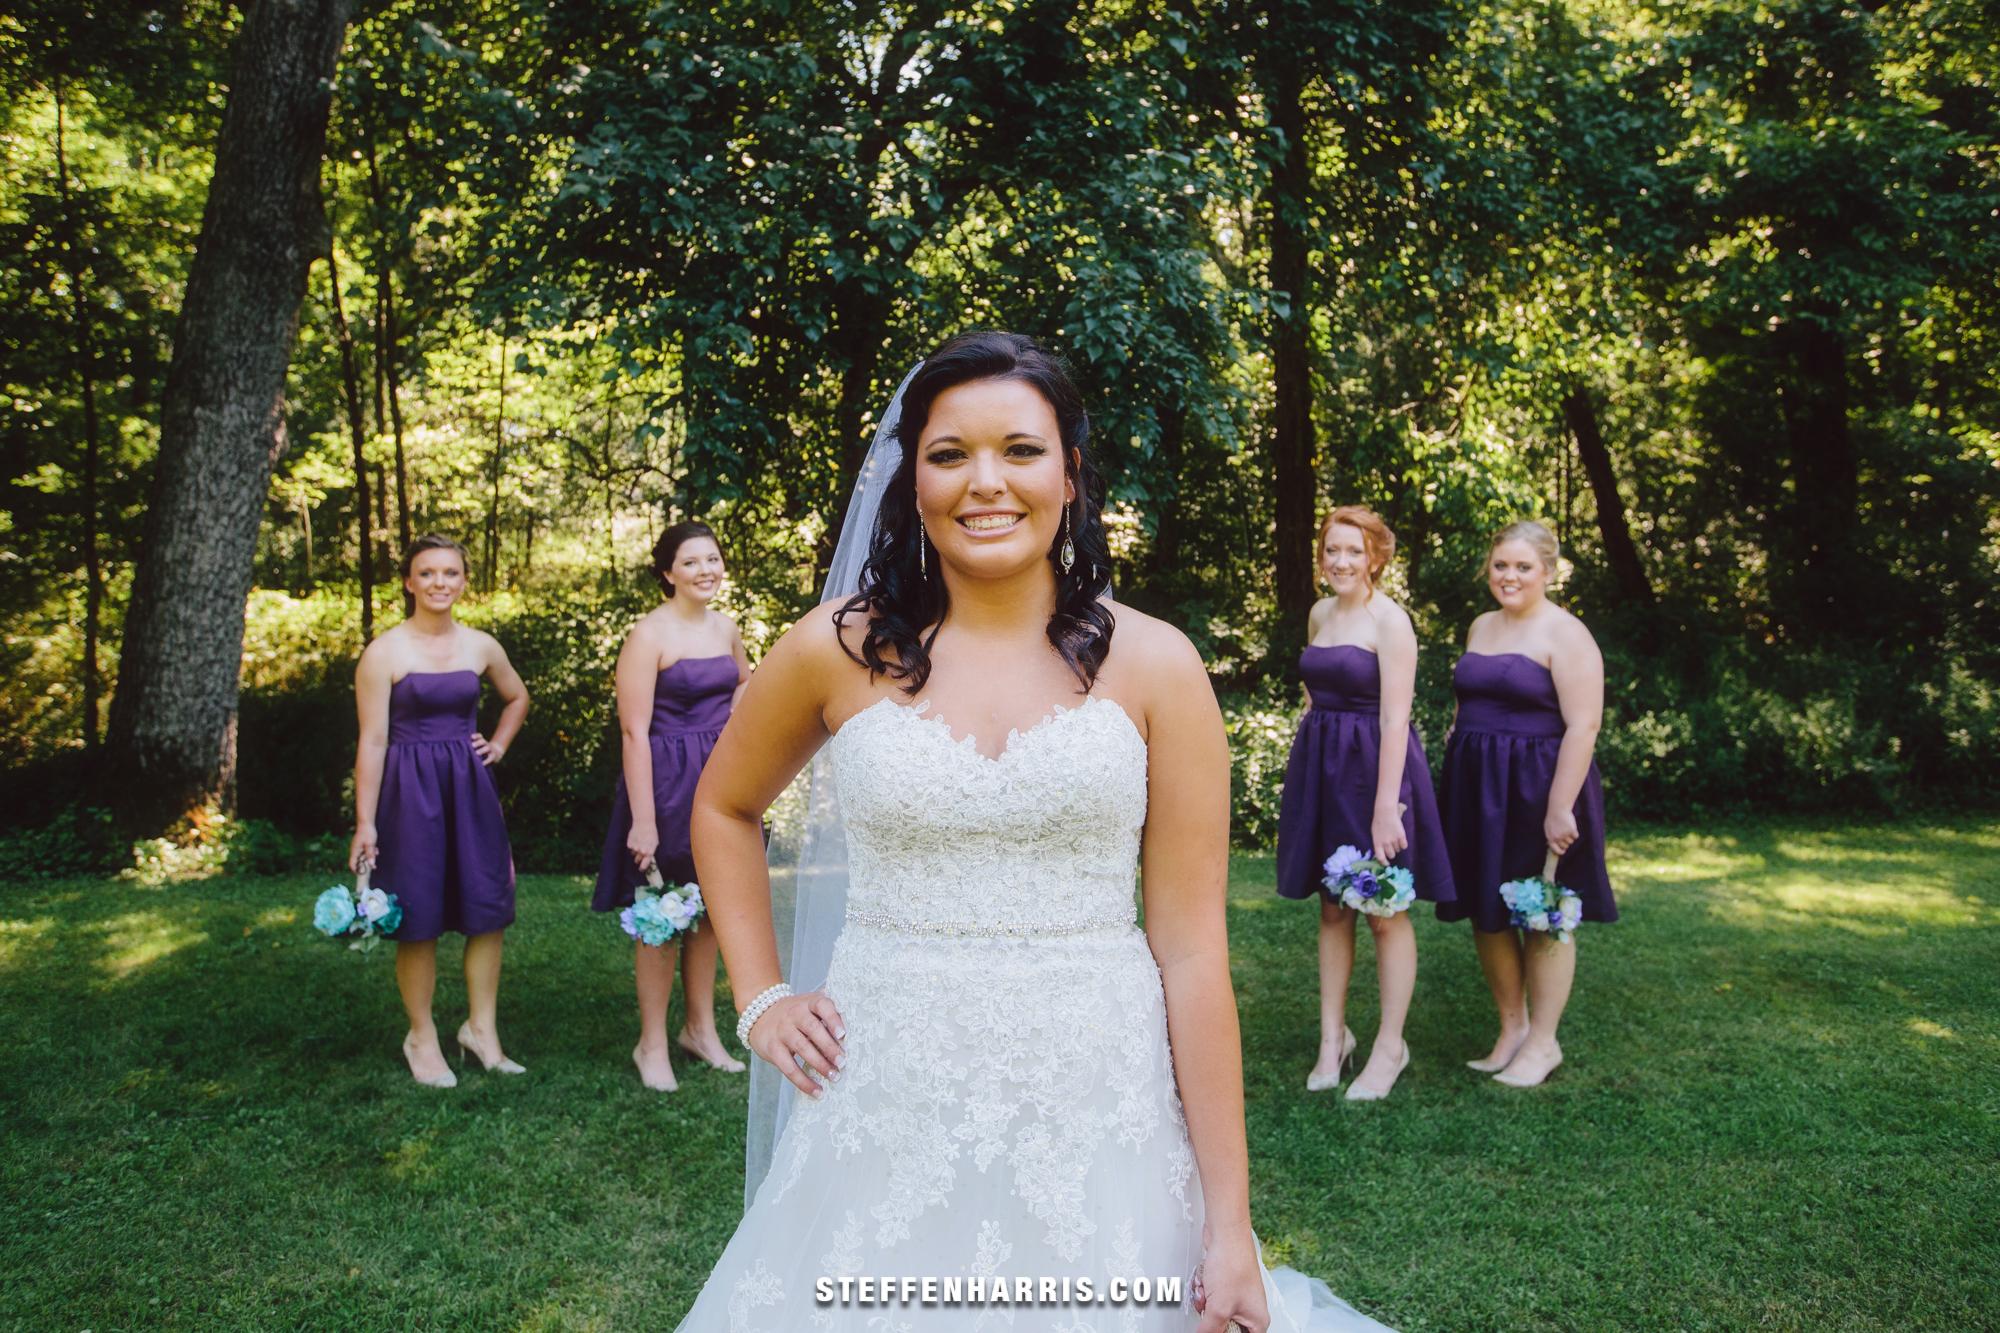 casey-aaron-salem-il-wedding-photography-35